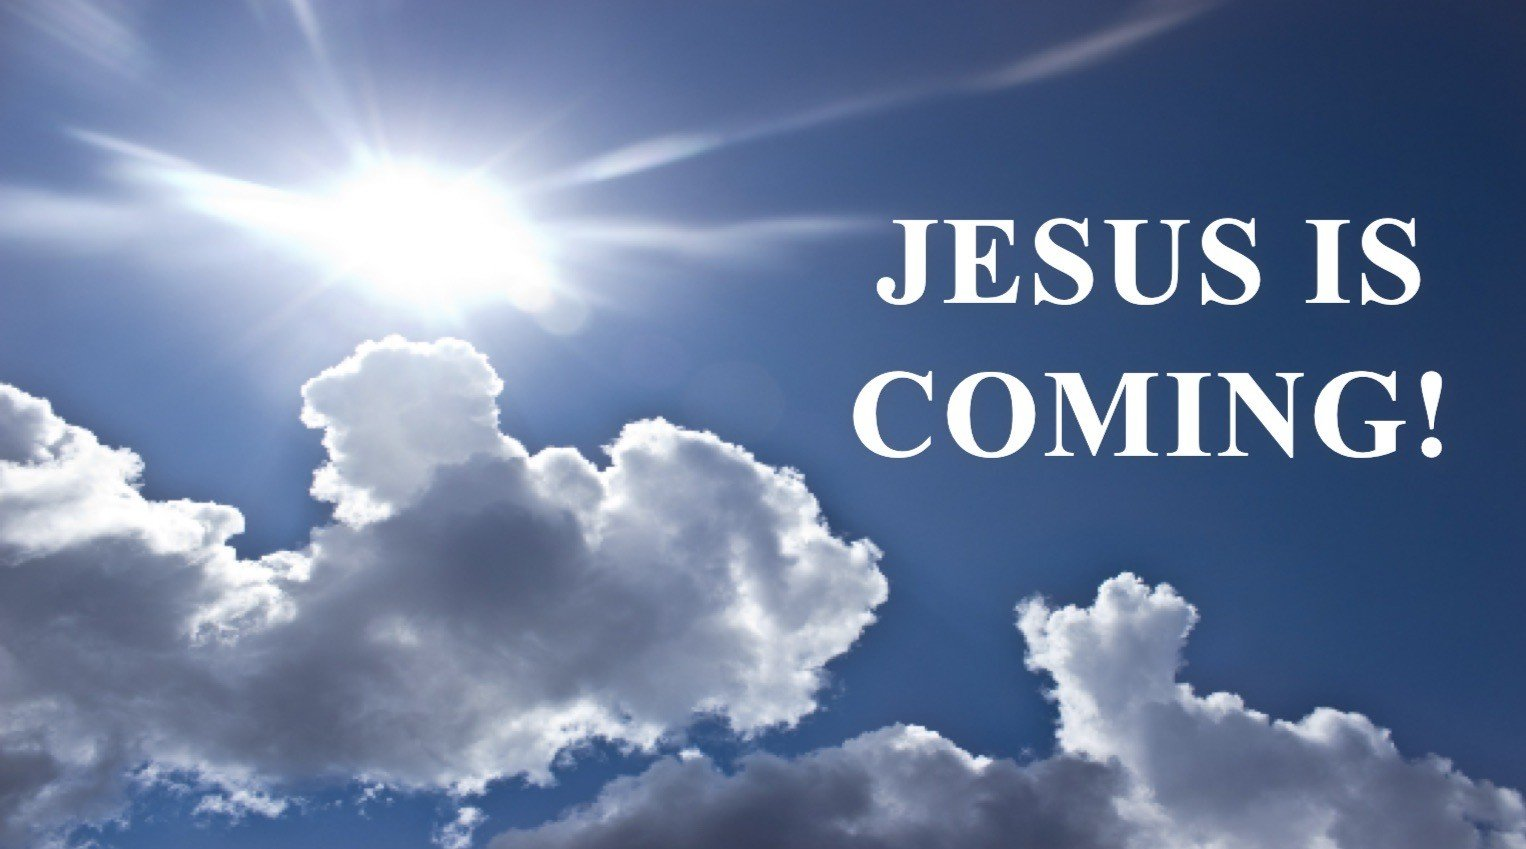 Jesus-is-coming